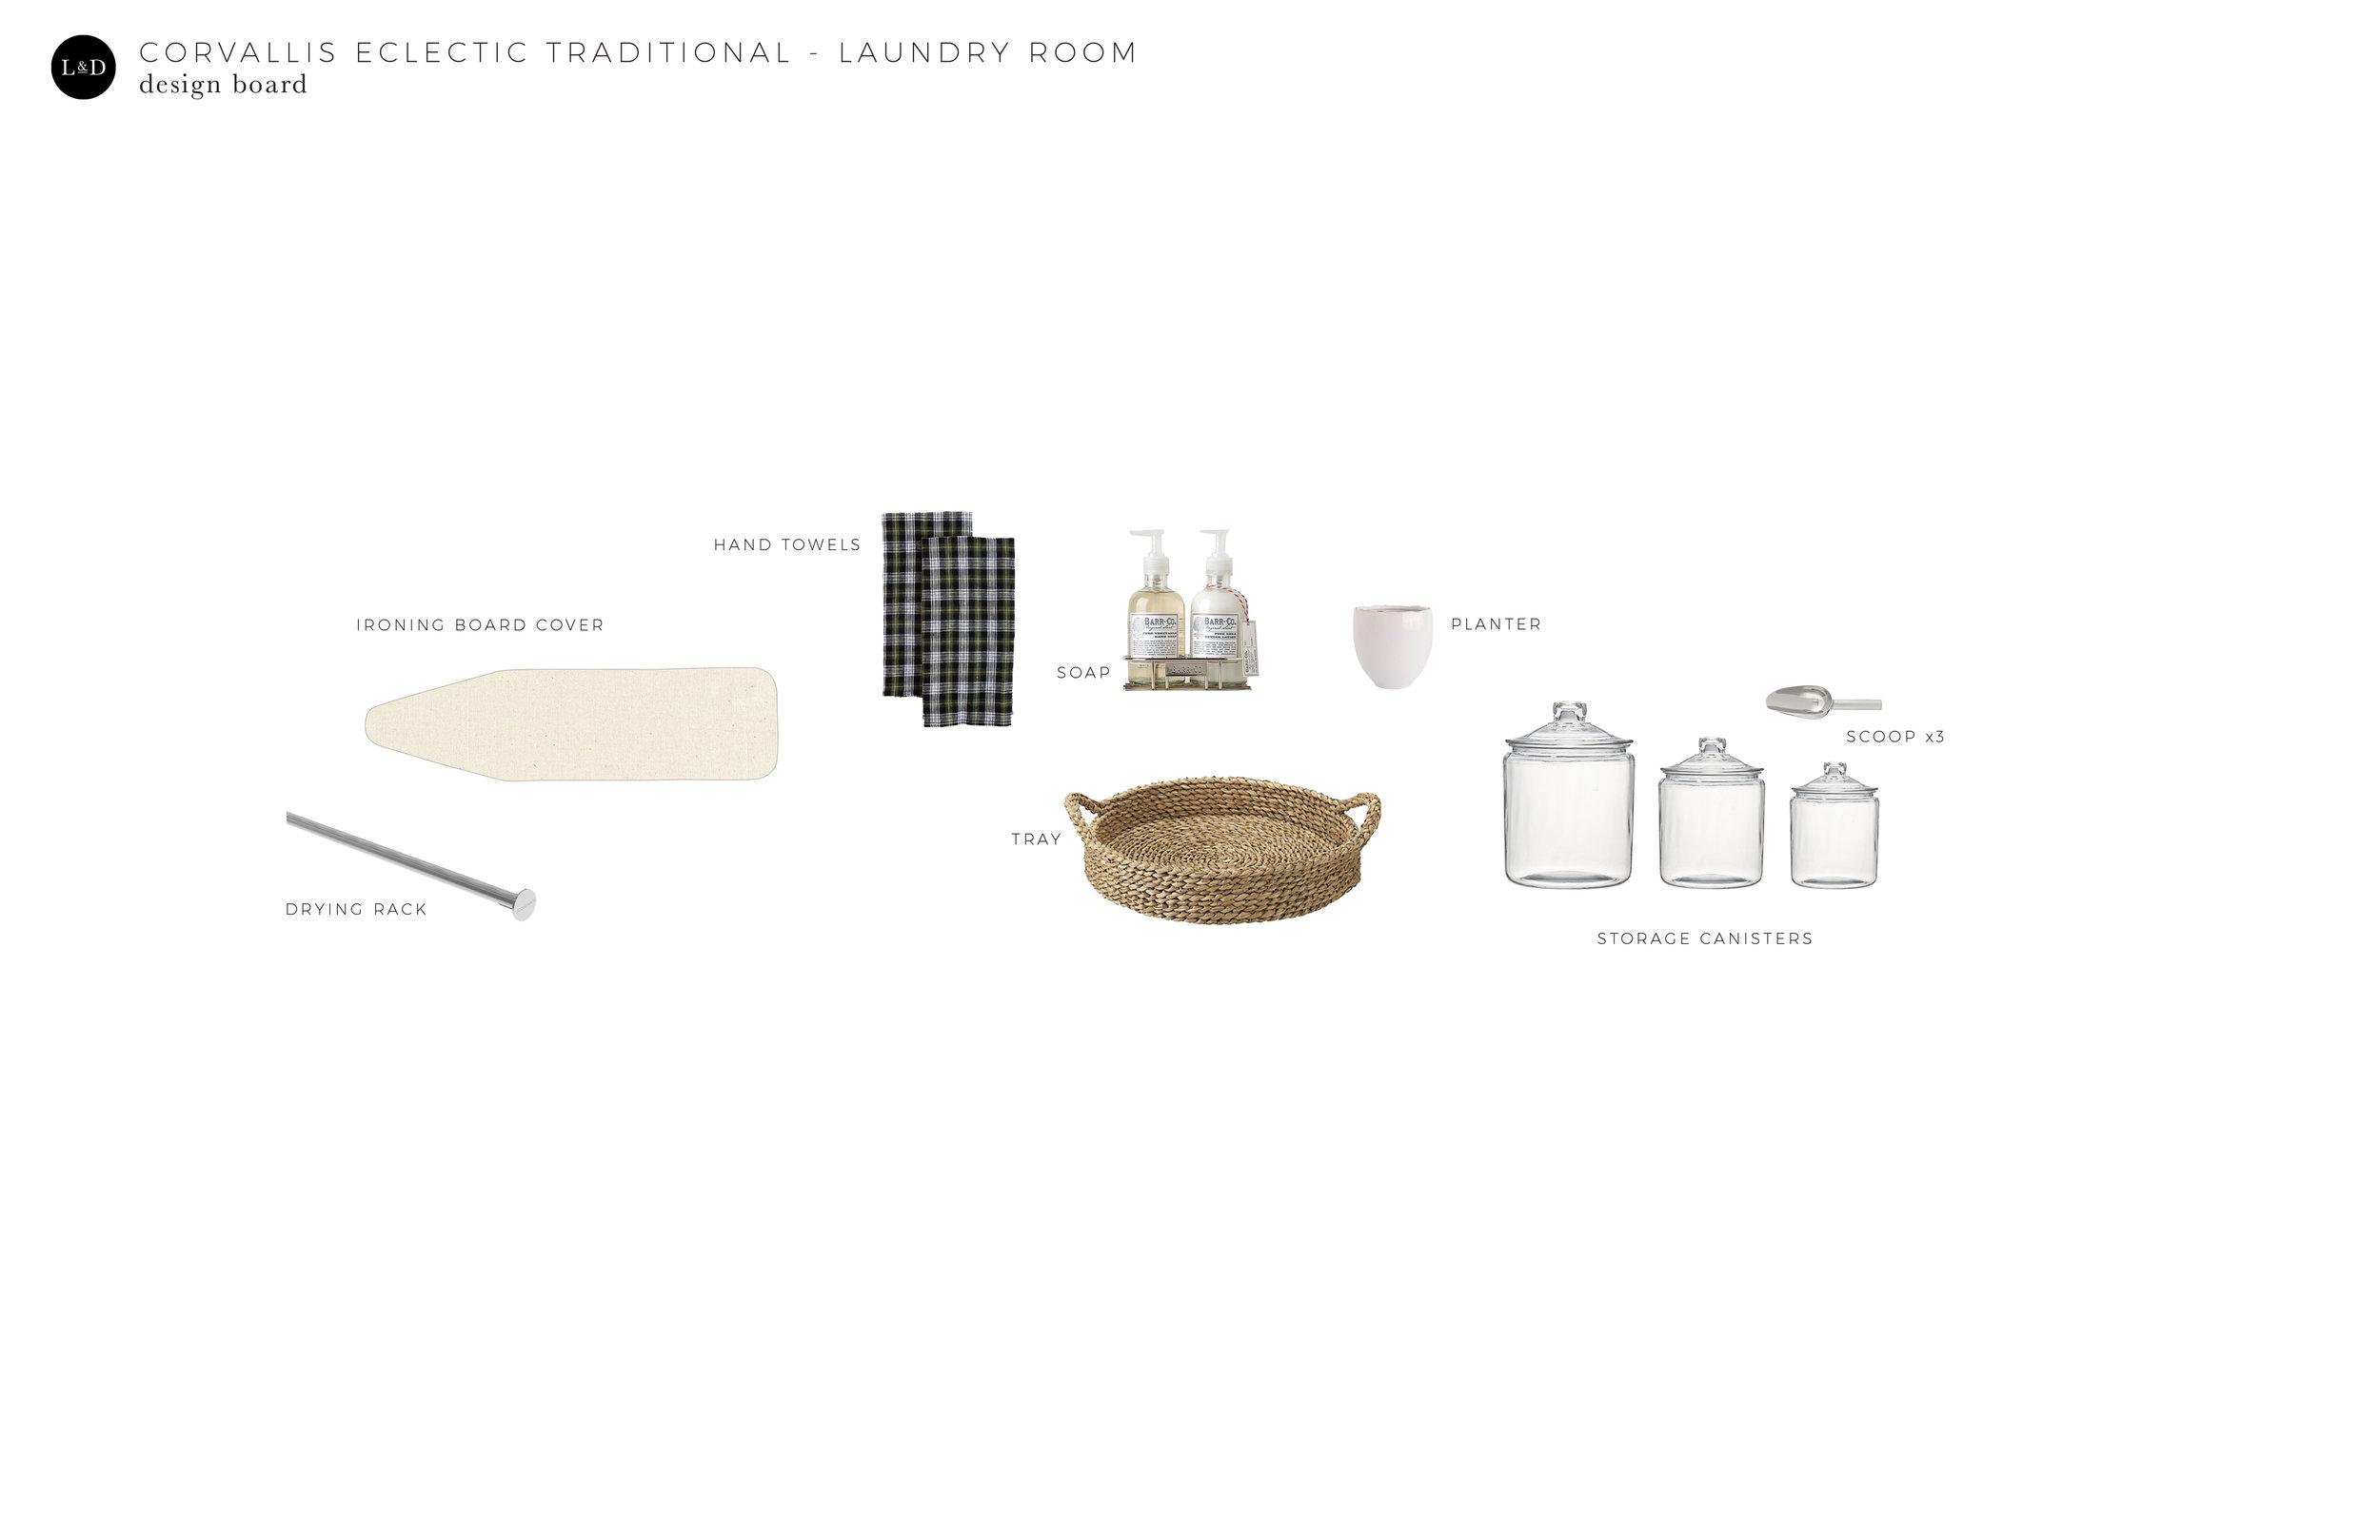 L+D_DesignBoard_CorvallisEclecticTraditional_laundry.jpg